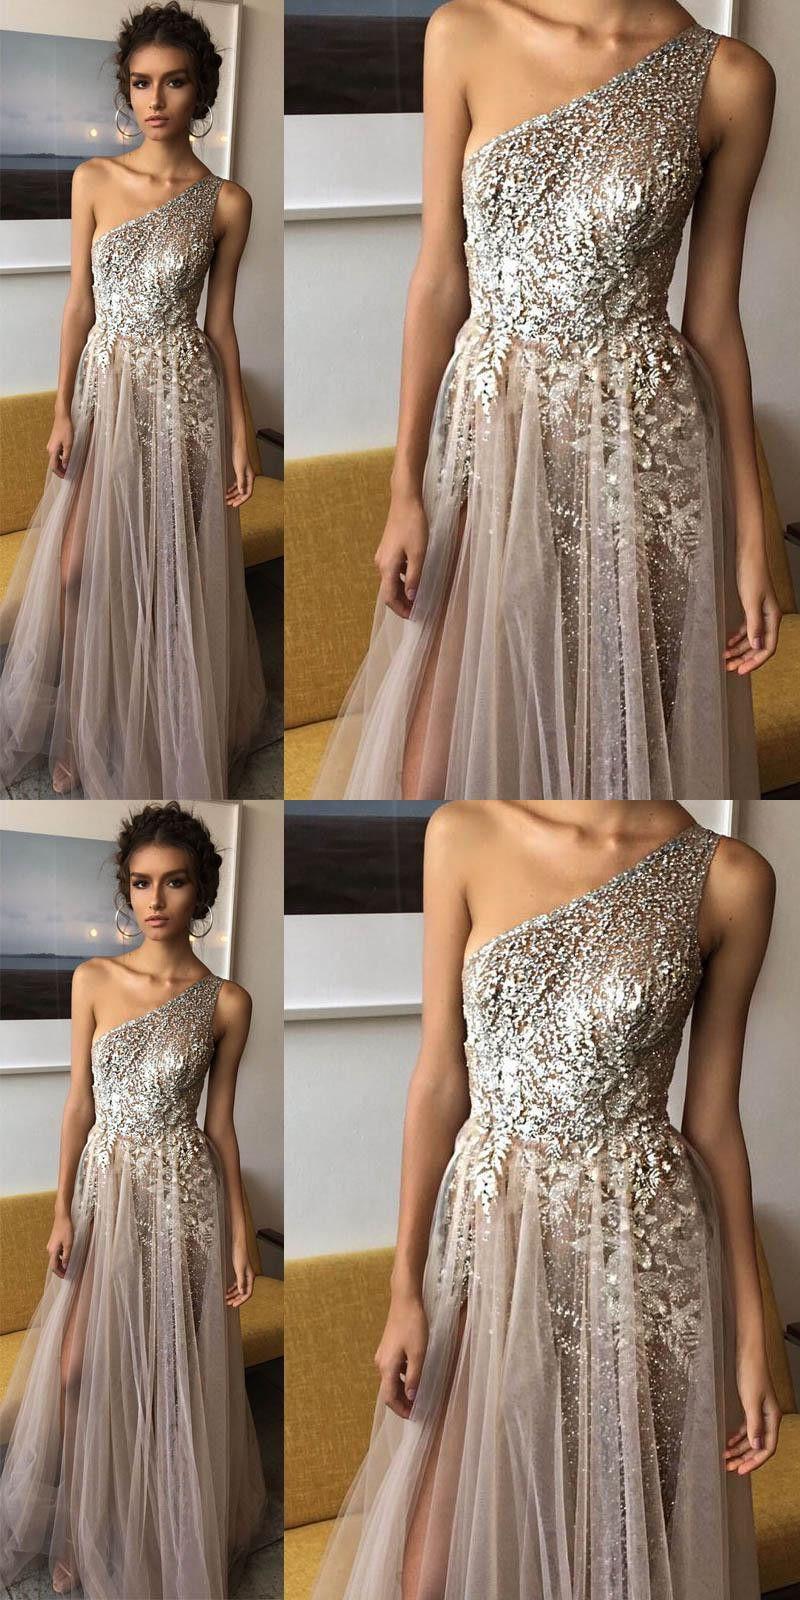 New arrival prom dressone shoulder shinning side split elegant long